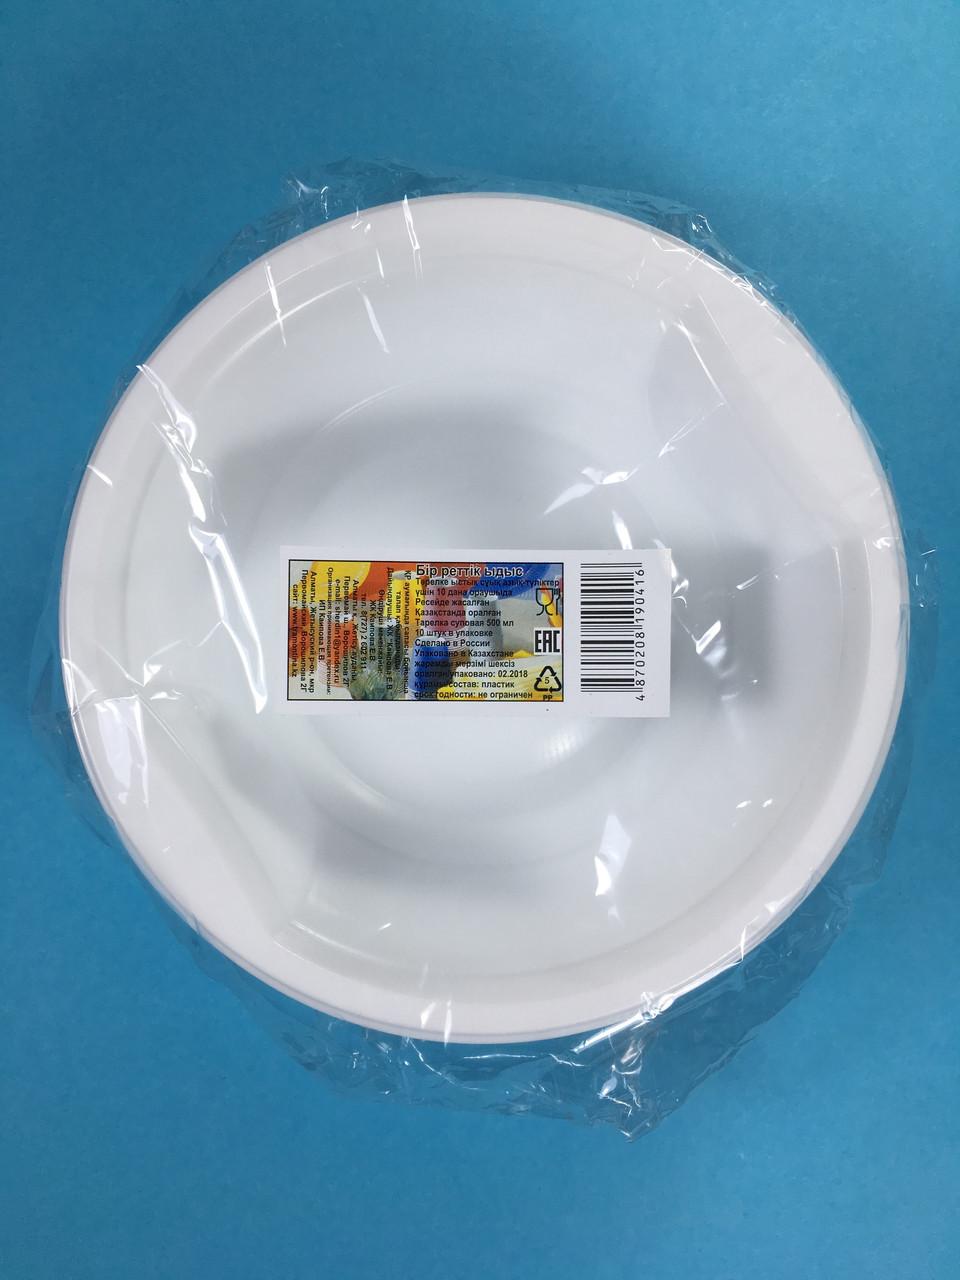 Тарелка одноразовая белая 500 мл (суповая) 10 шт/уп Sherdin